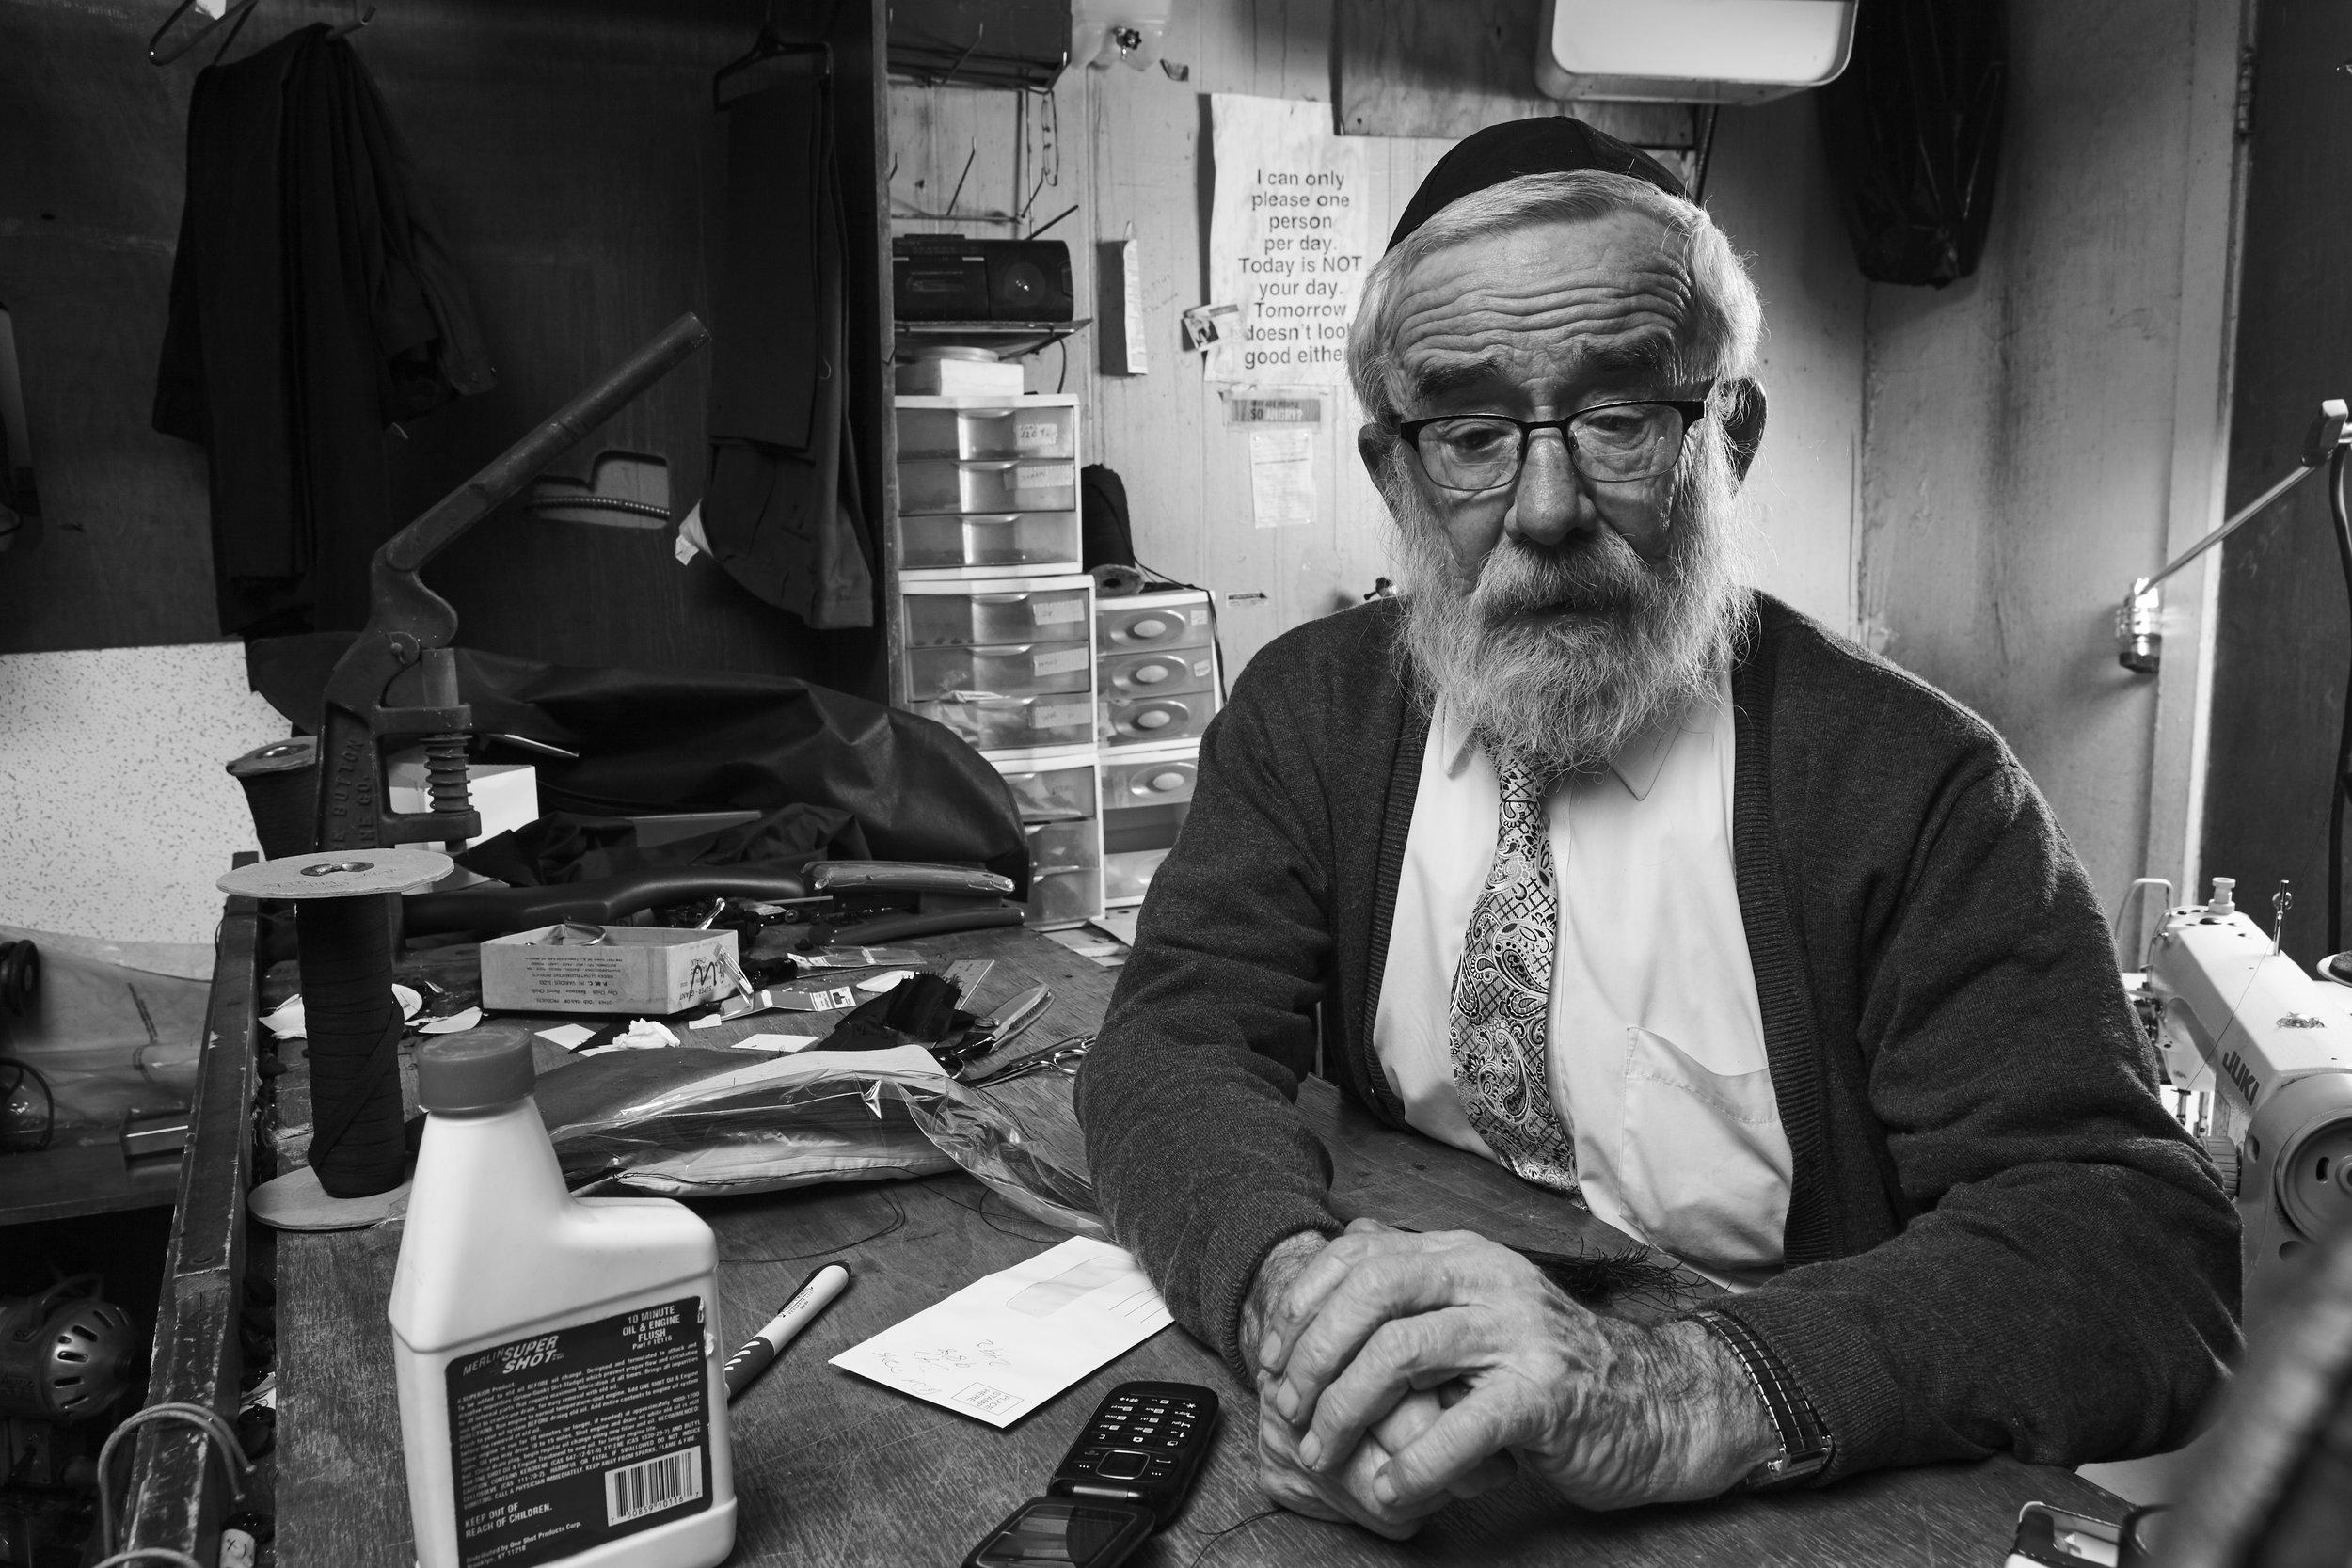 RABBI ISRAEL SHEMTOV, TAILOR, ACTIVIST